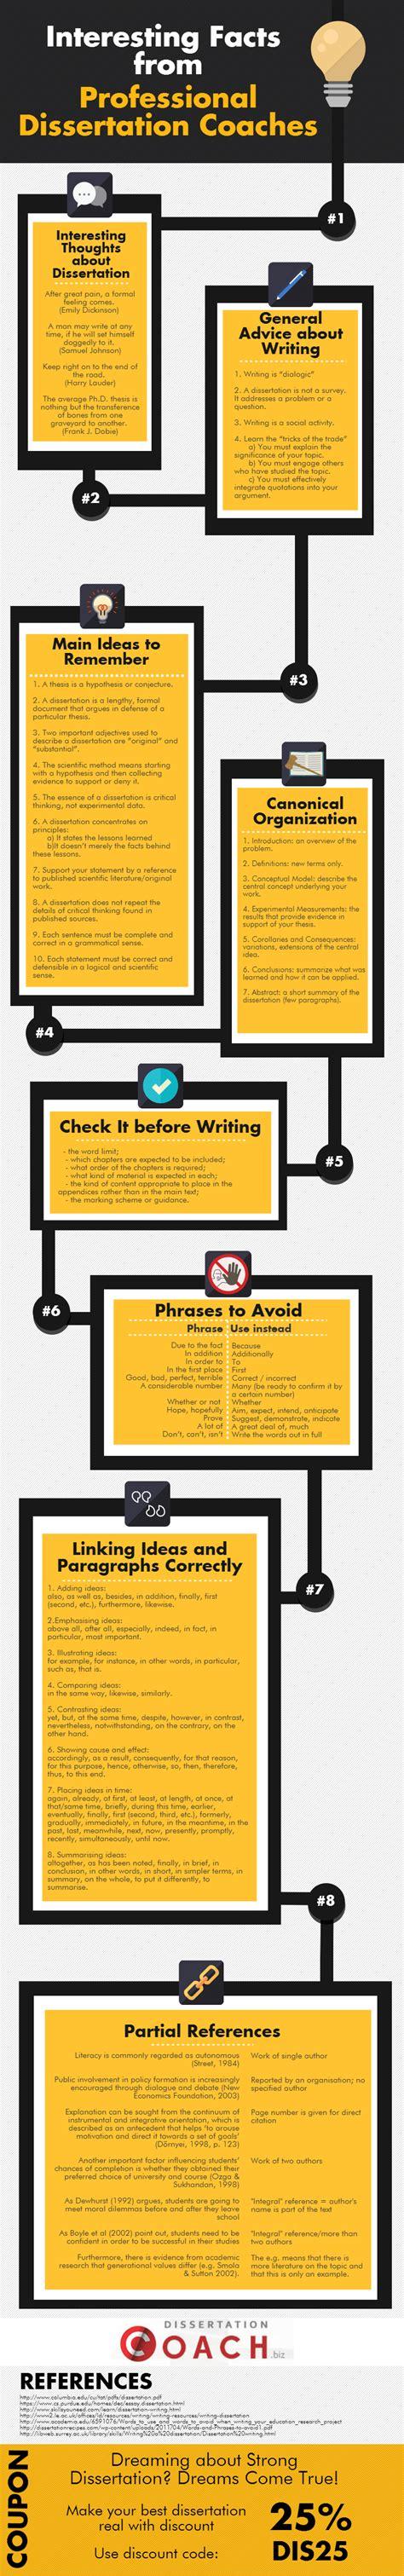 dissertation coach coaching dissertation ideas 28 images dissertation